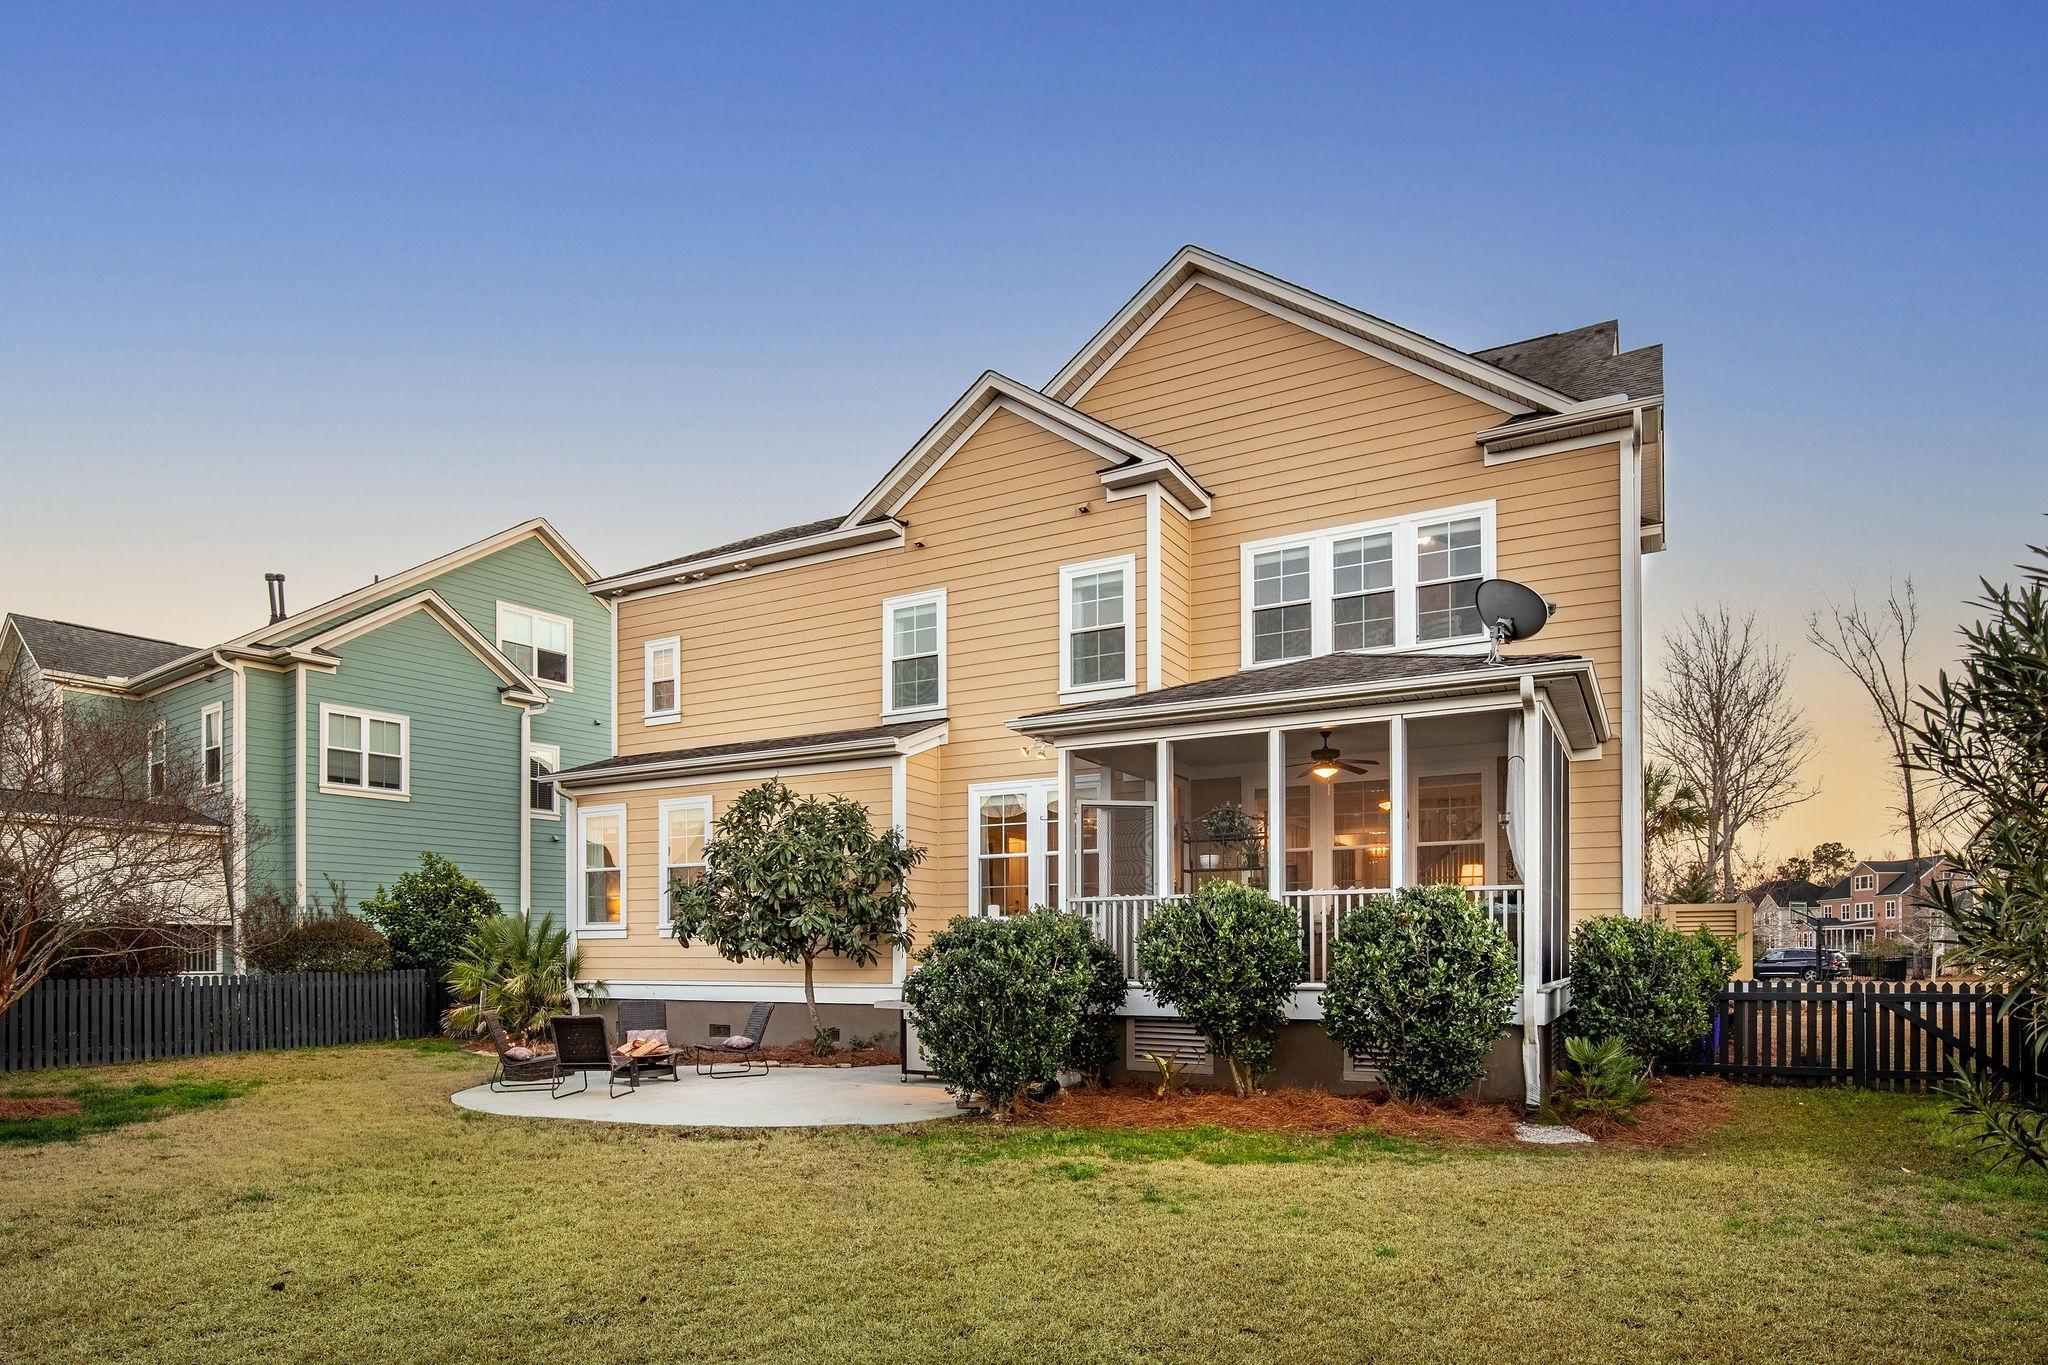 Dunes West Homes For Sale - 3212 Hatchway, Mount Pleasant, SC - 44